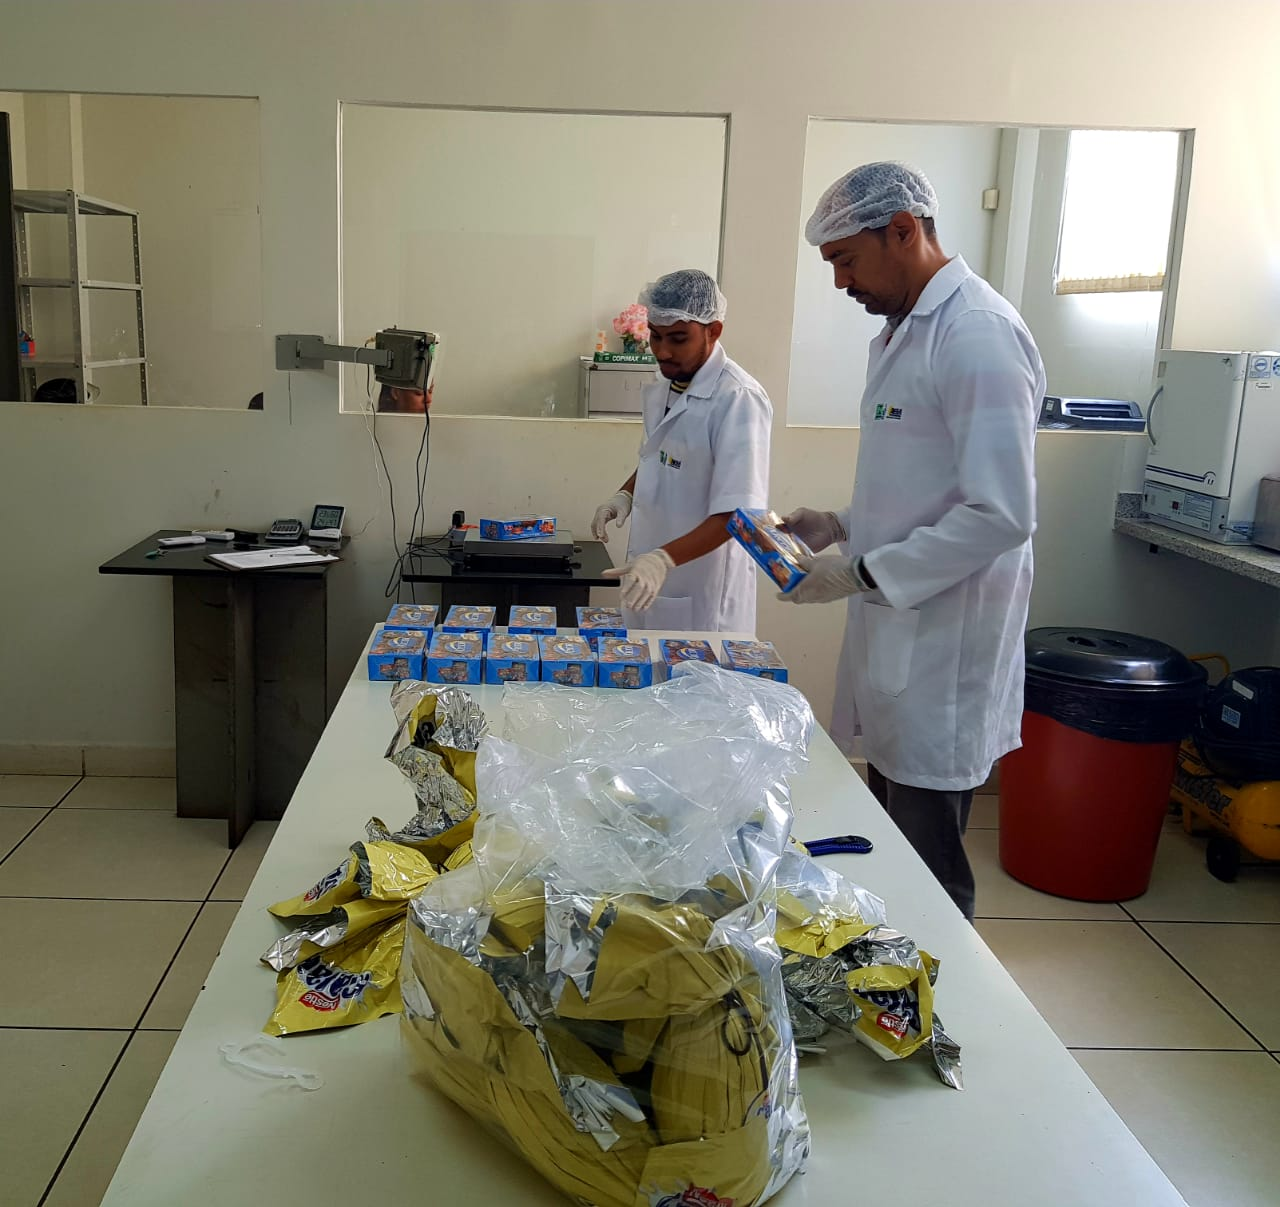 Metrologia aprova 90% das marcas de Ovos de Páscoa nos testes laboratoriais